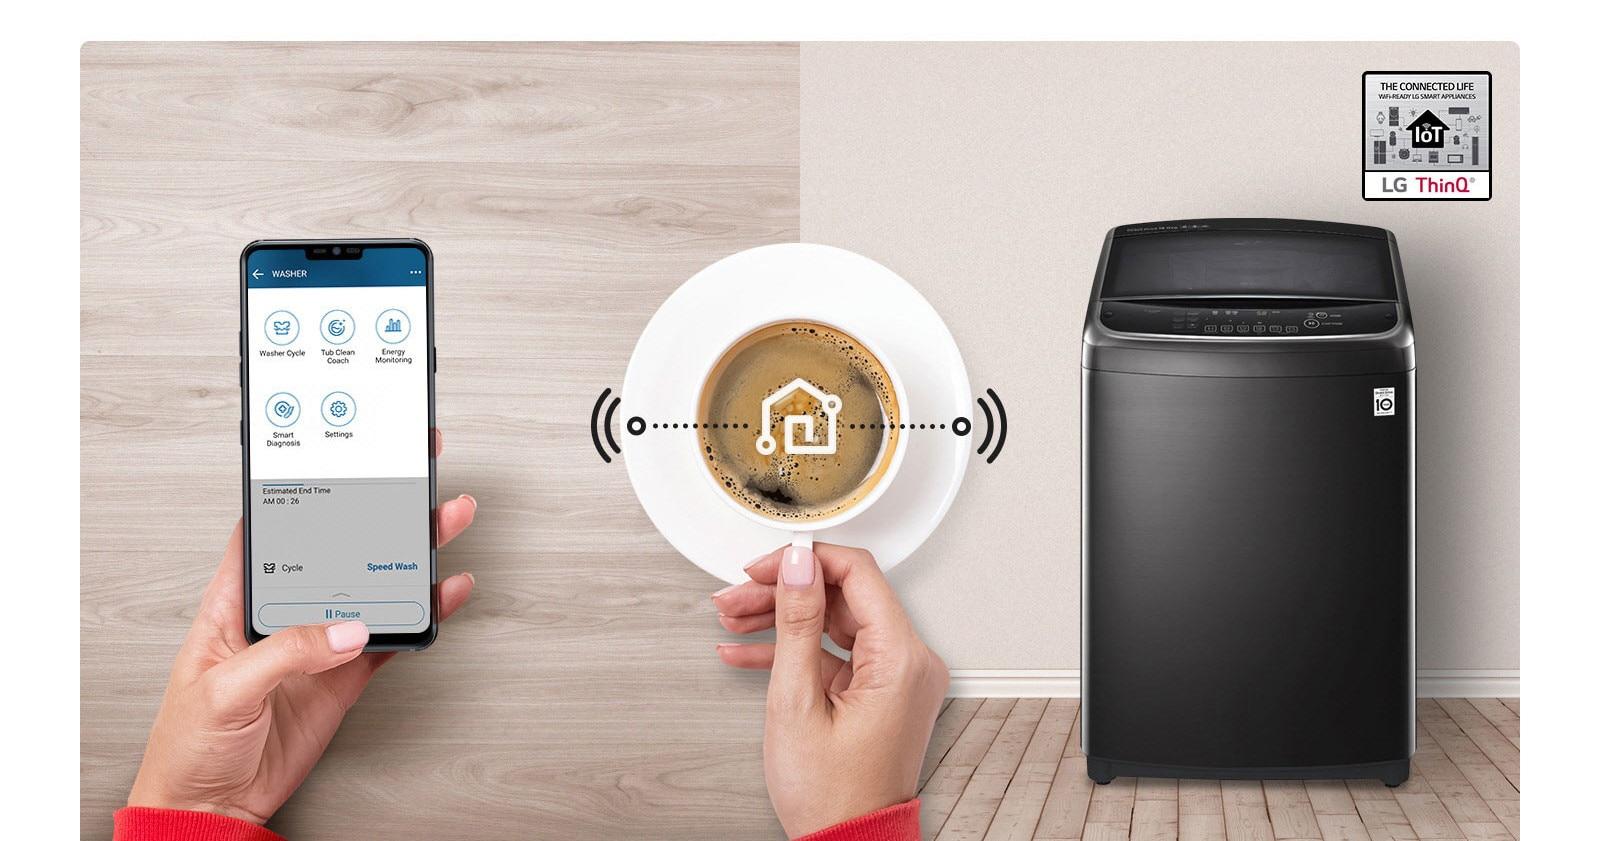 LG ThinQ Washing Machine Smart Laundry